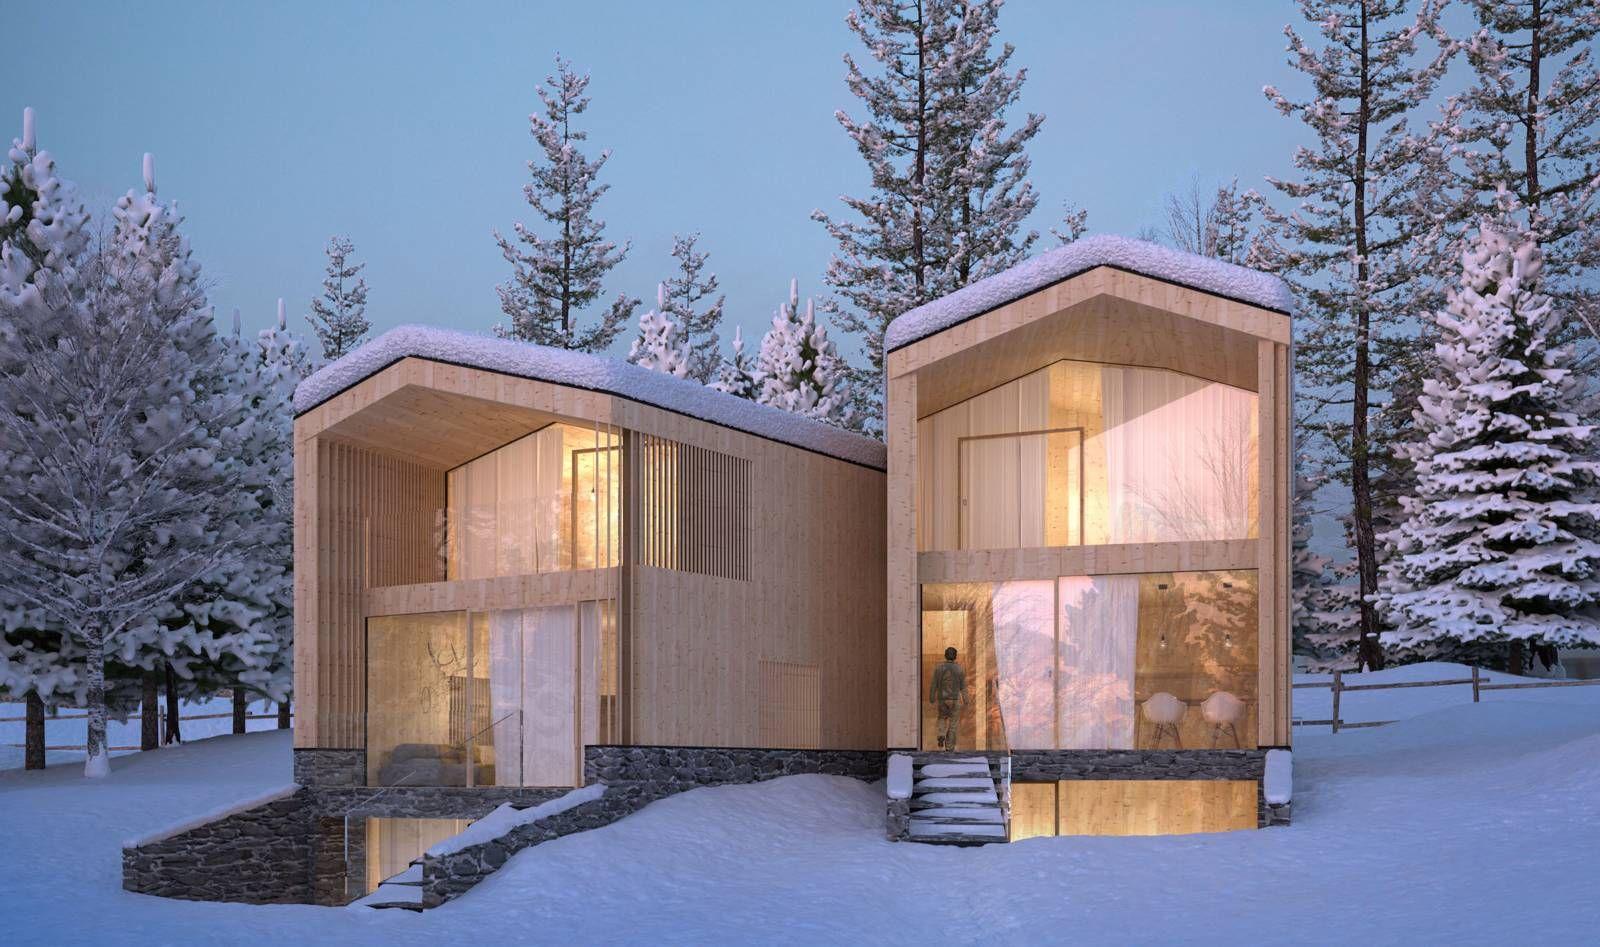 Haus Carezza\' auf monovolume:architektur+design in Bozen, Italien ...